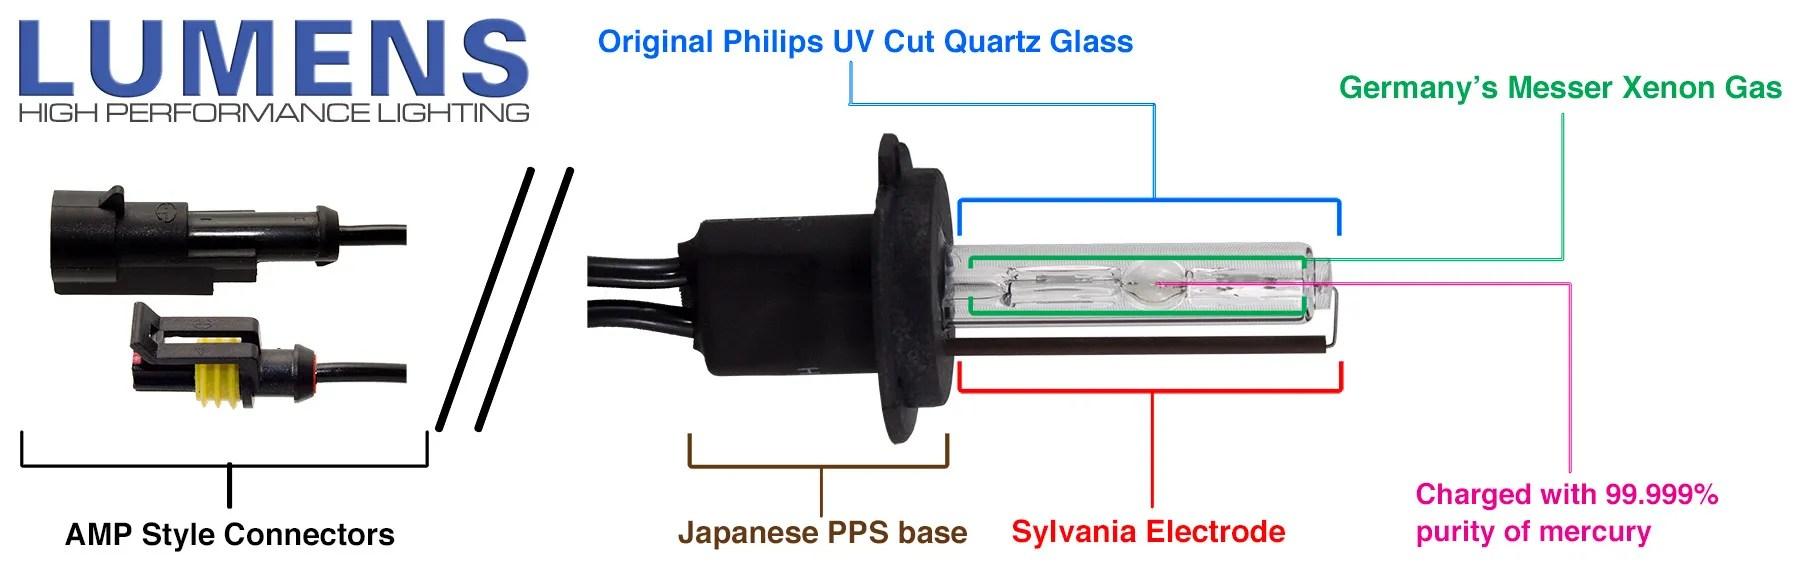 lumens high performance lighting xenon